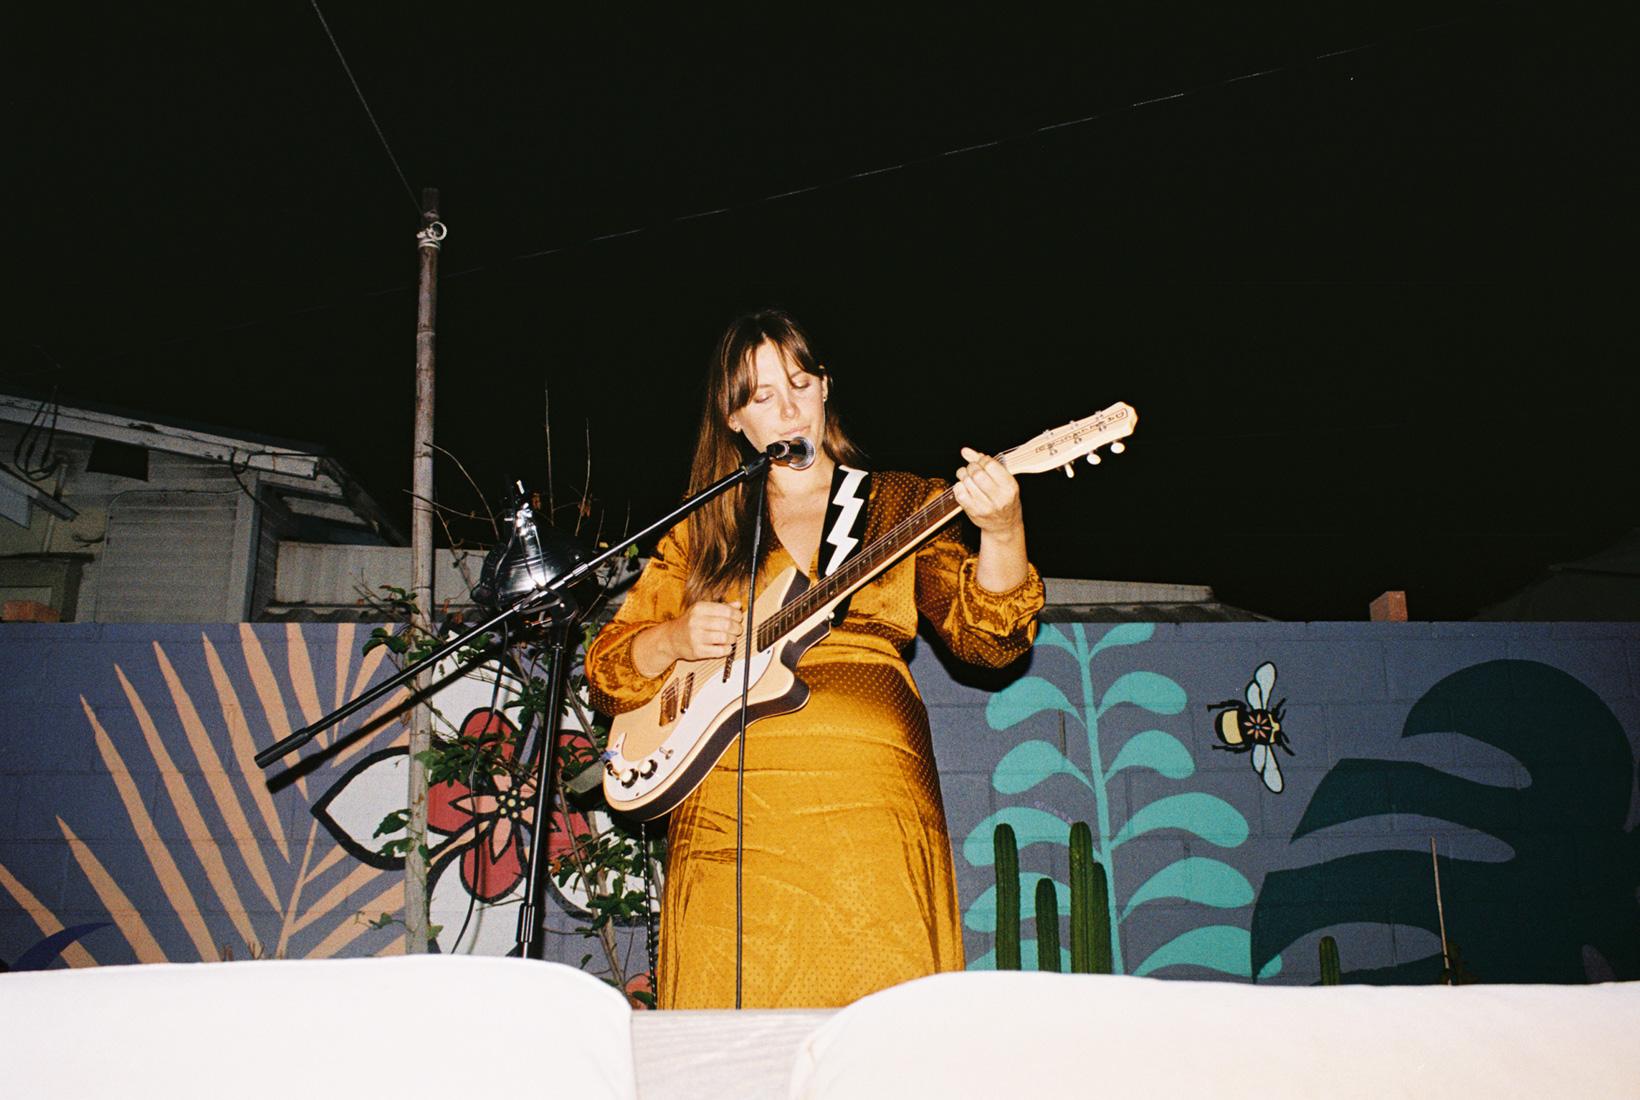 Mimi performing